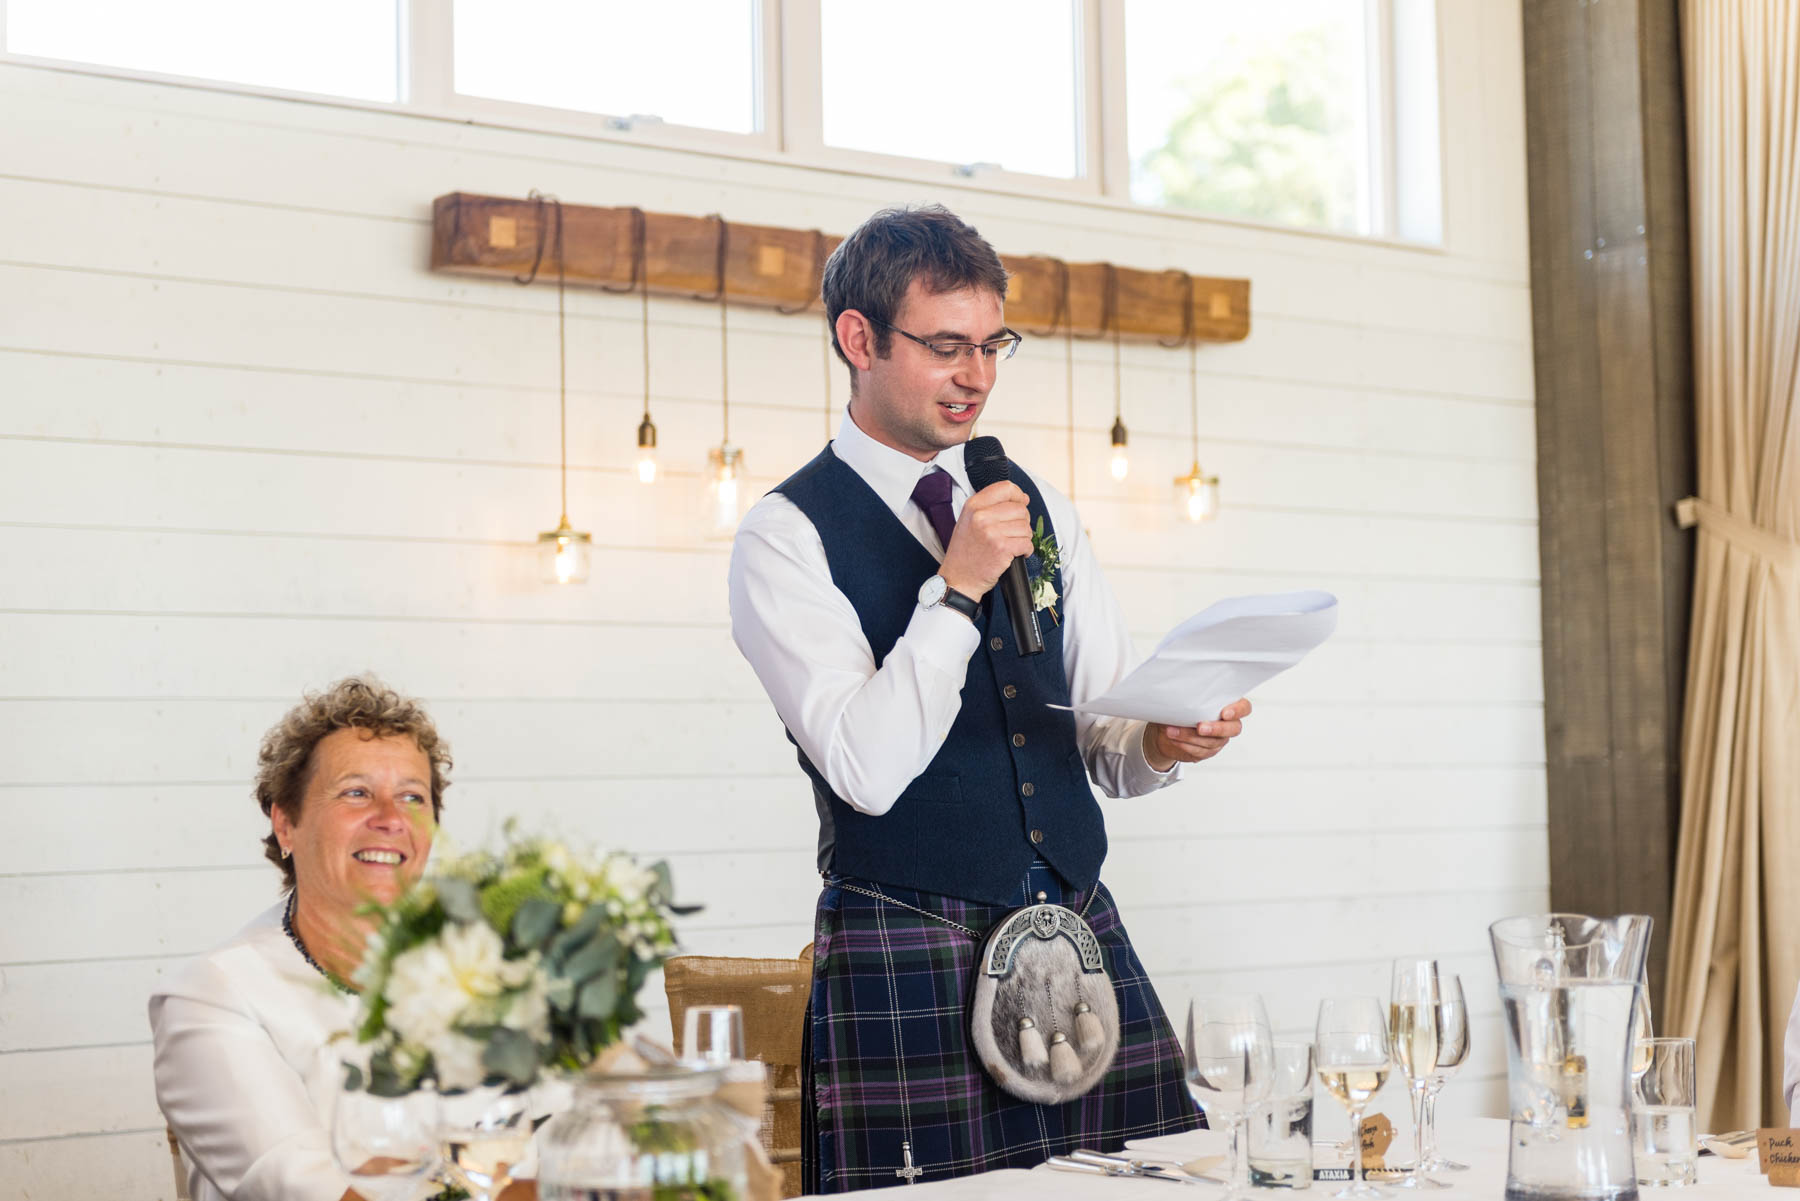 SJThomson_wedding_454.jpg